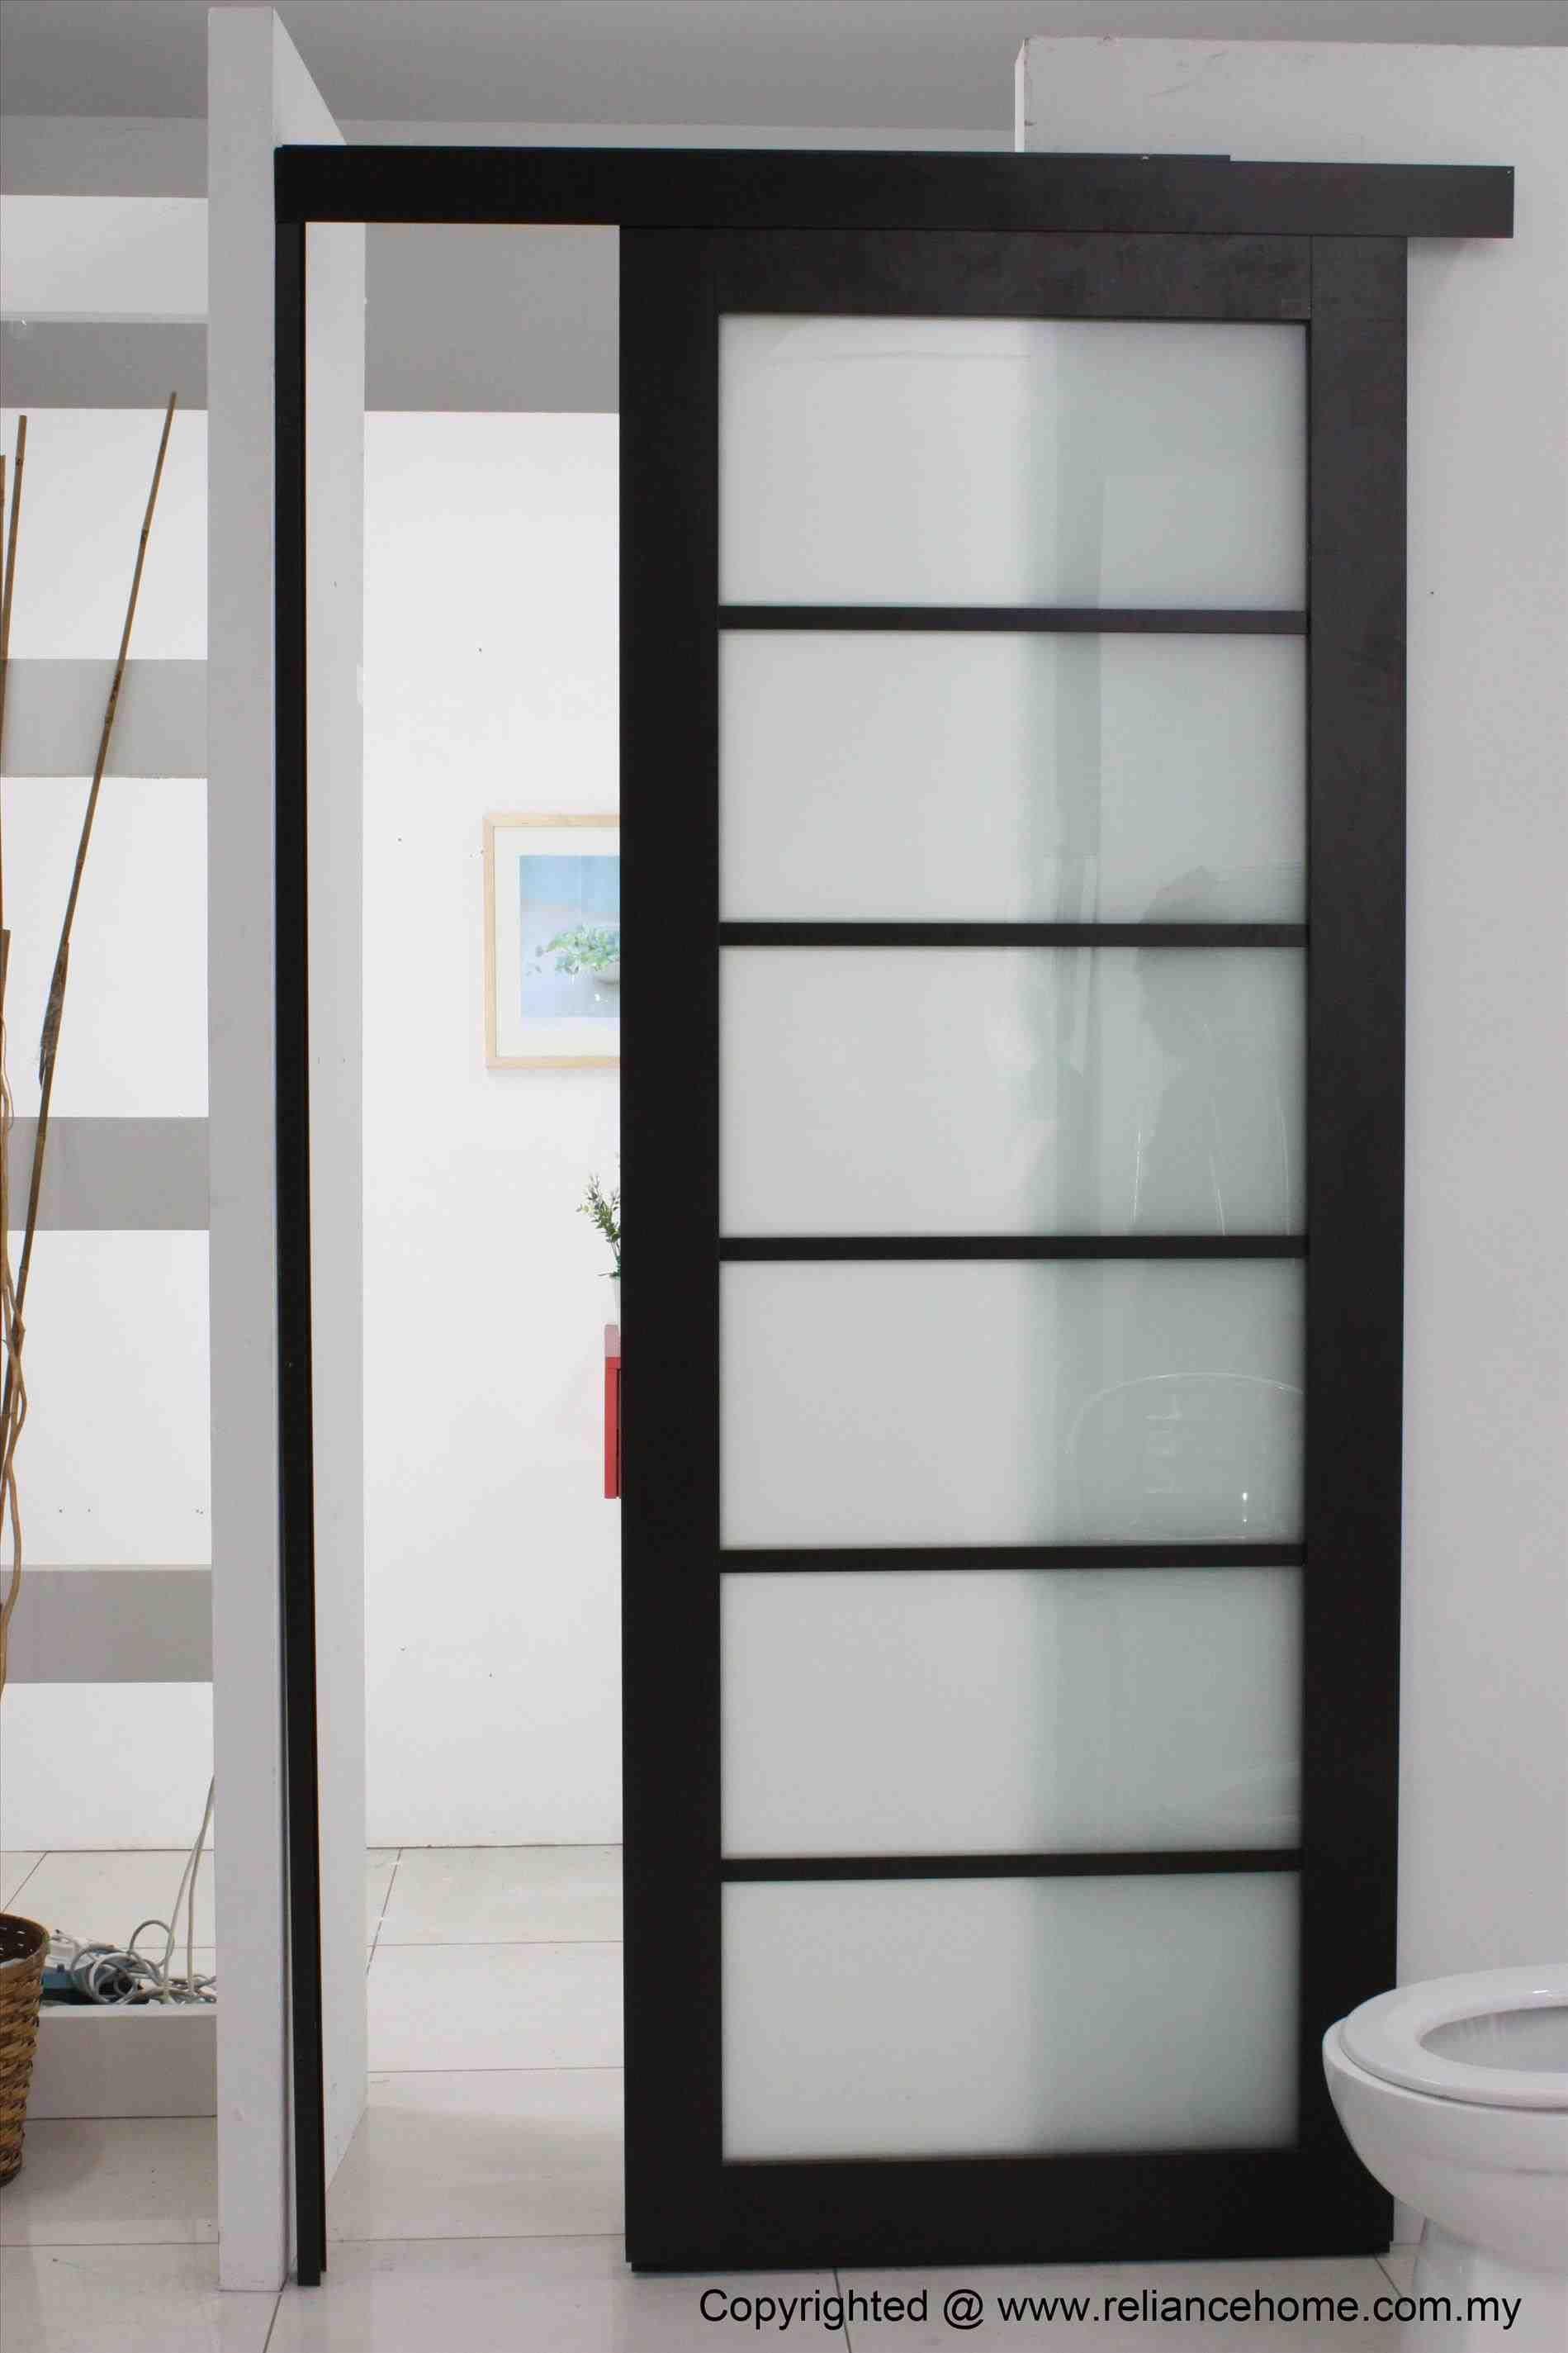 This bathroom plastic door designs - cabinet:medicine cabinet with